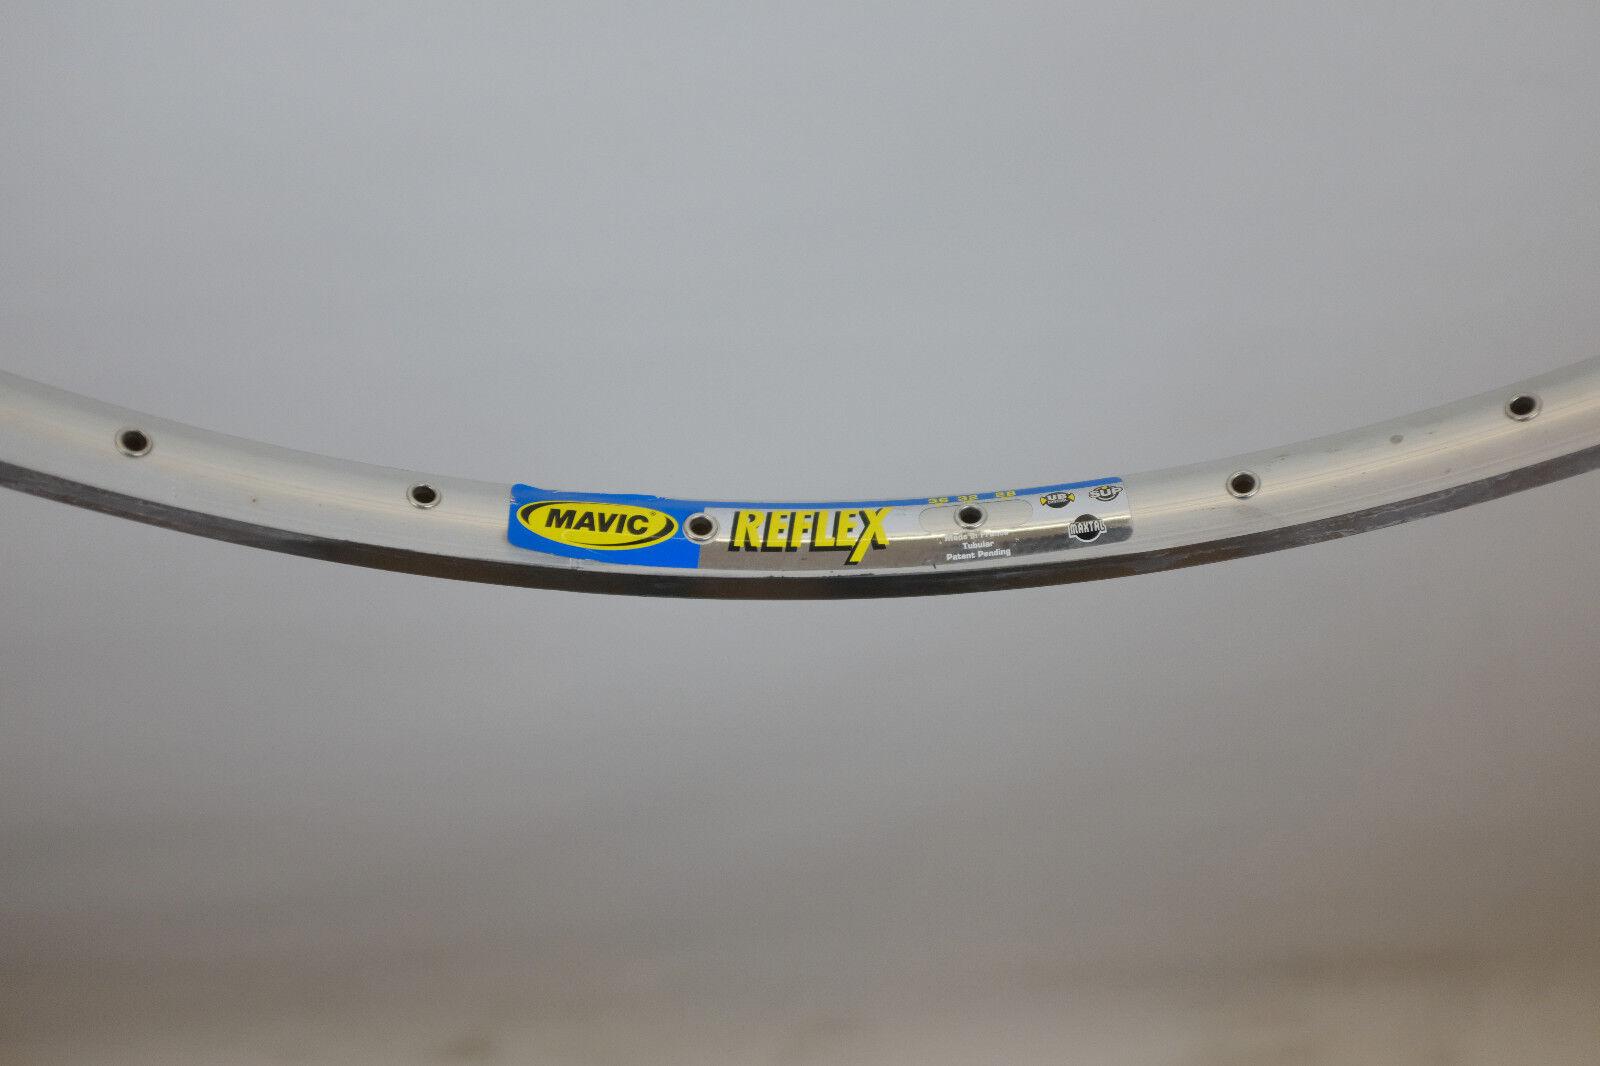 MAVIC REFLEX Schlauchreifenfelge tubular  rim NOS  buy best